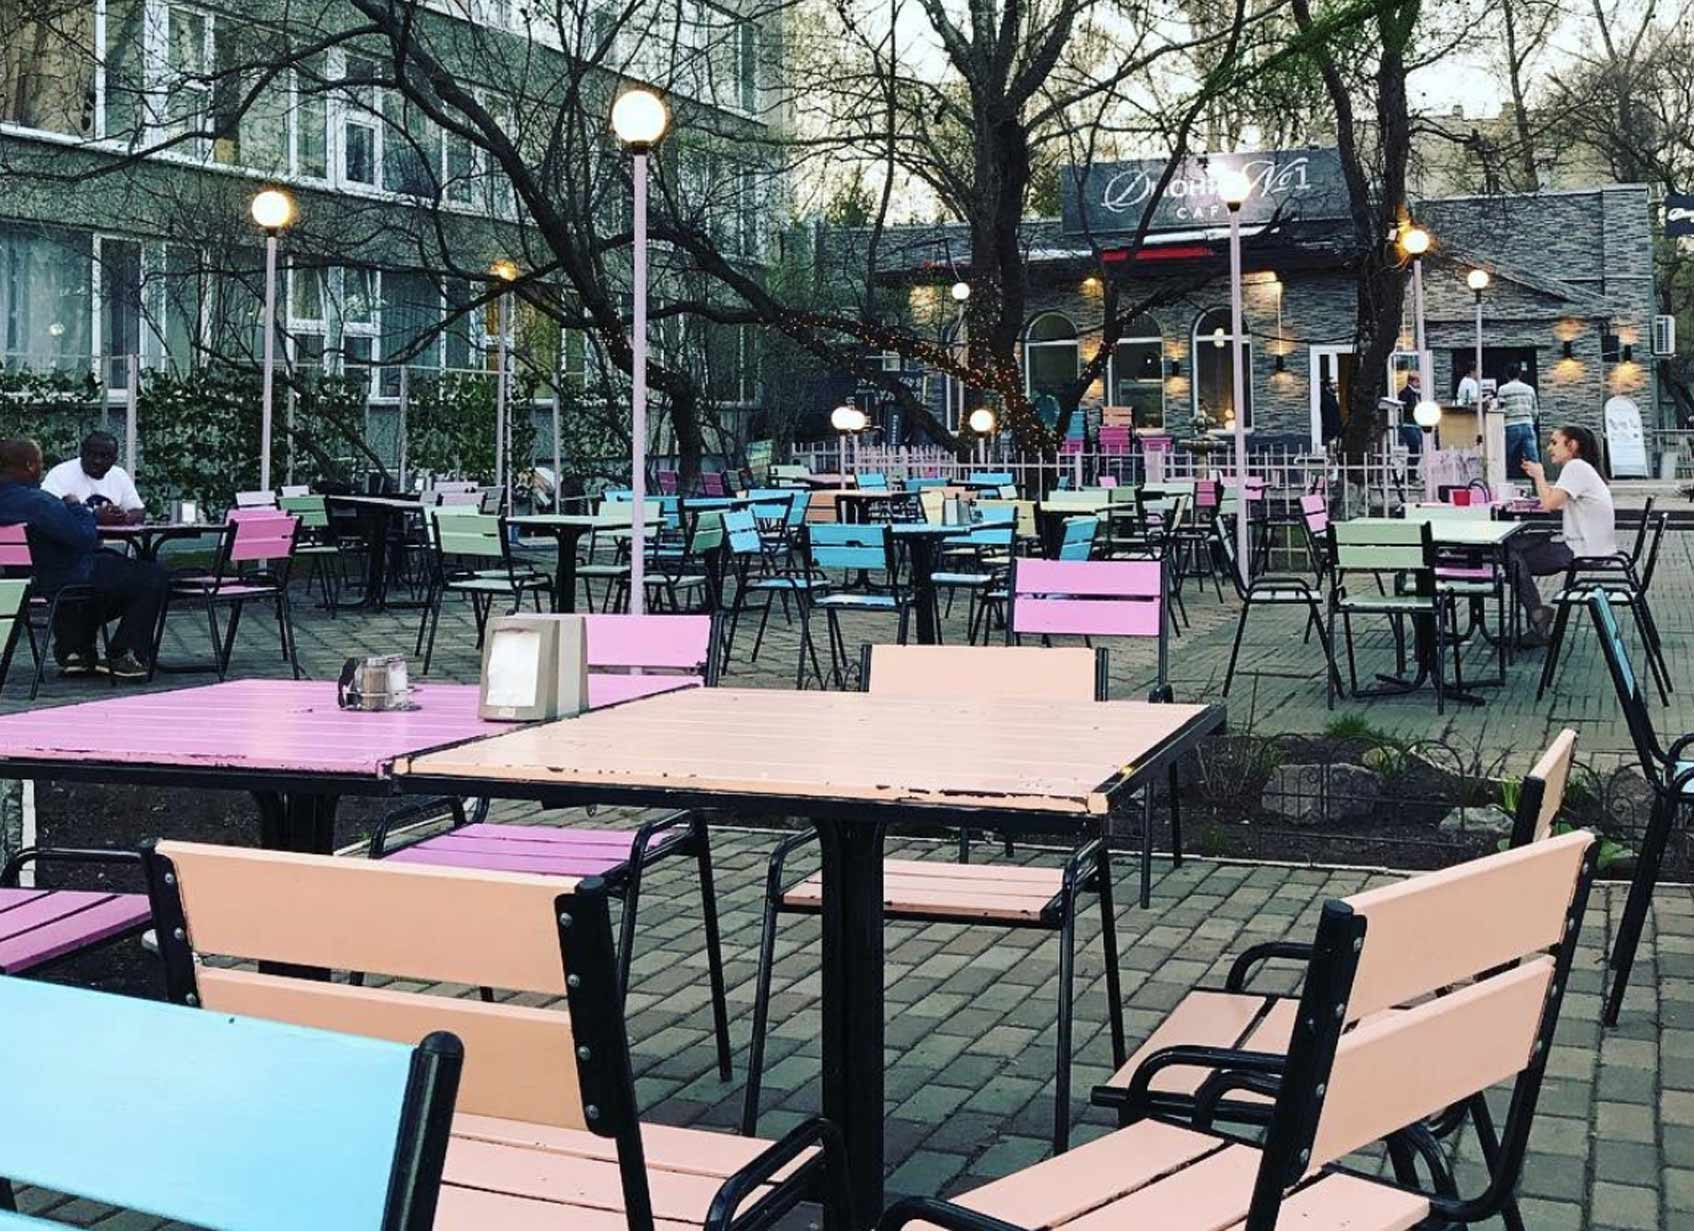 студгородок РУДН кафе рестораны